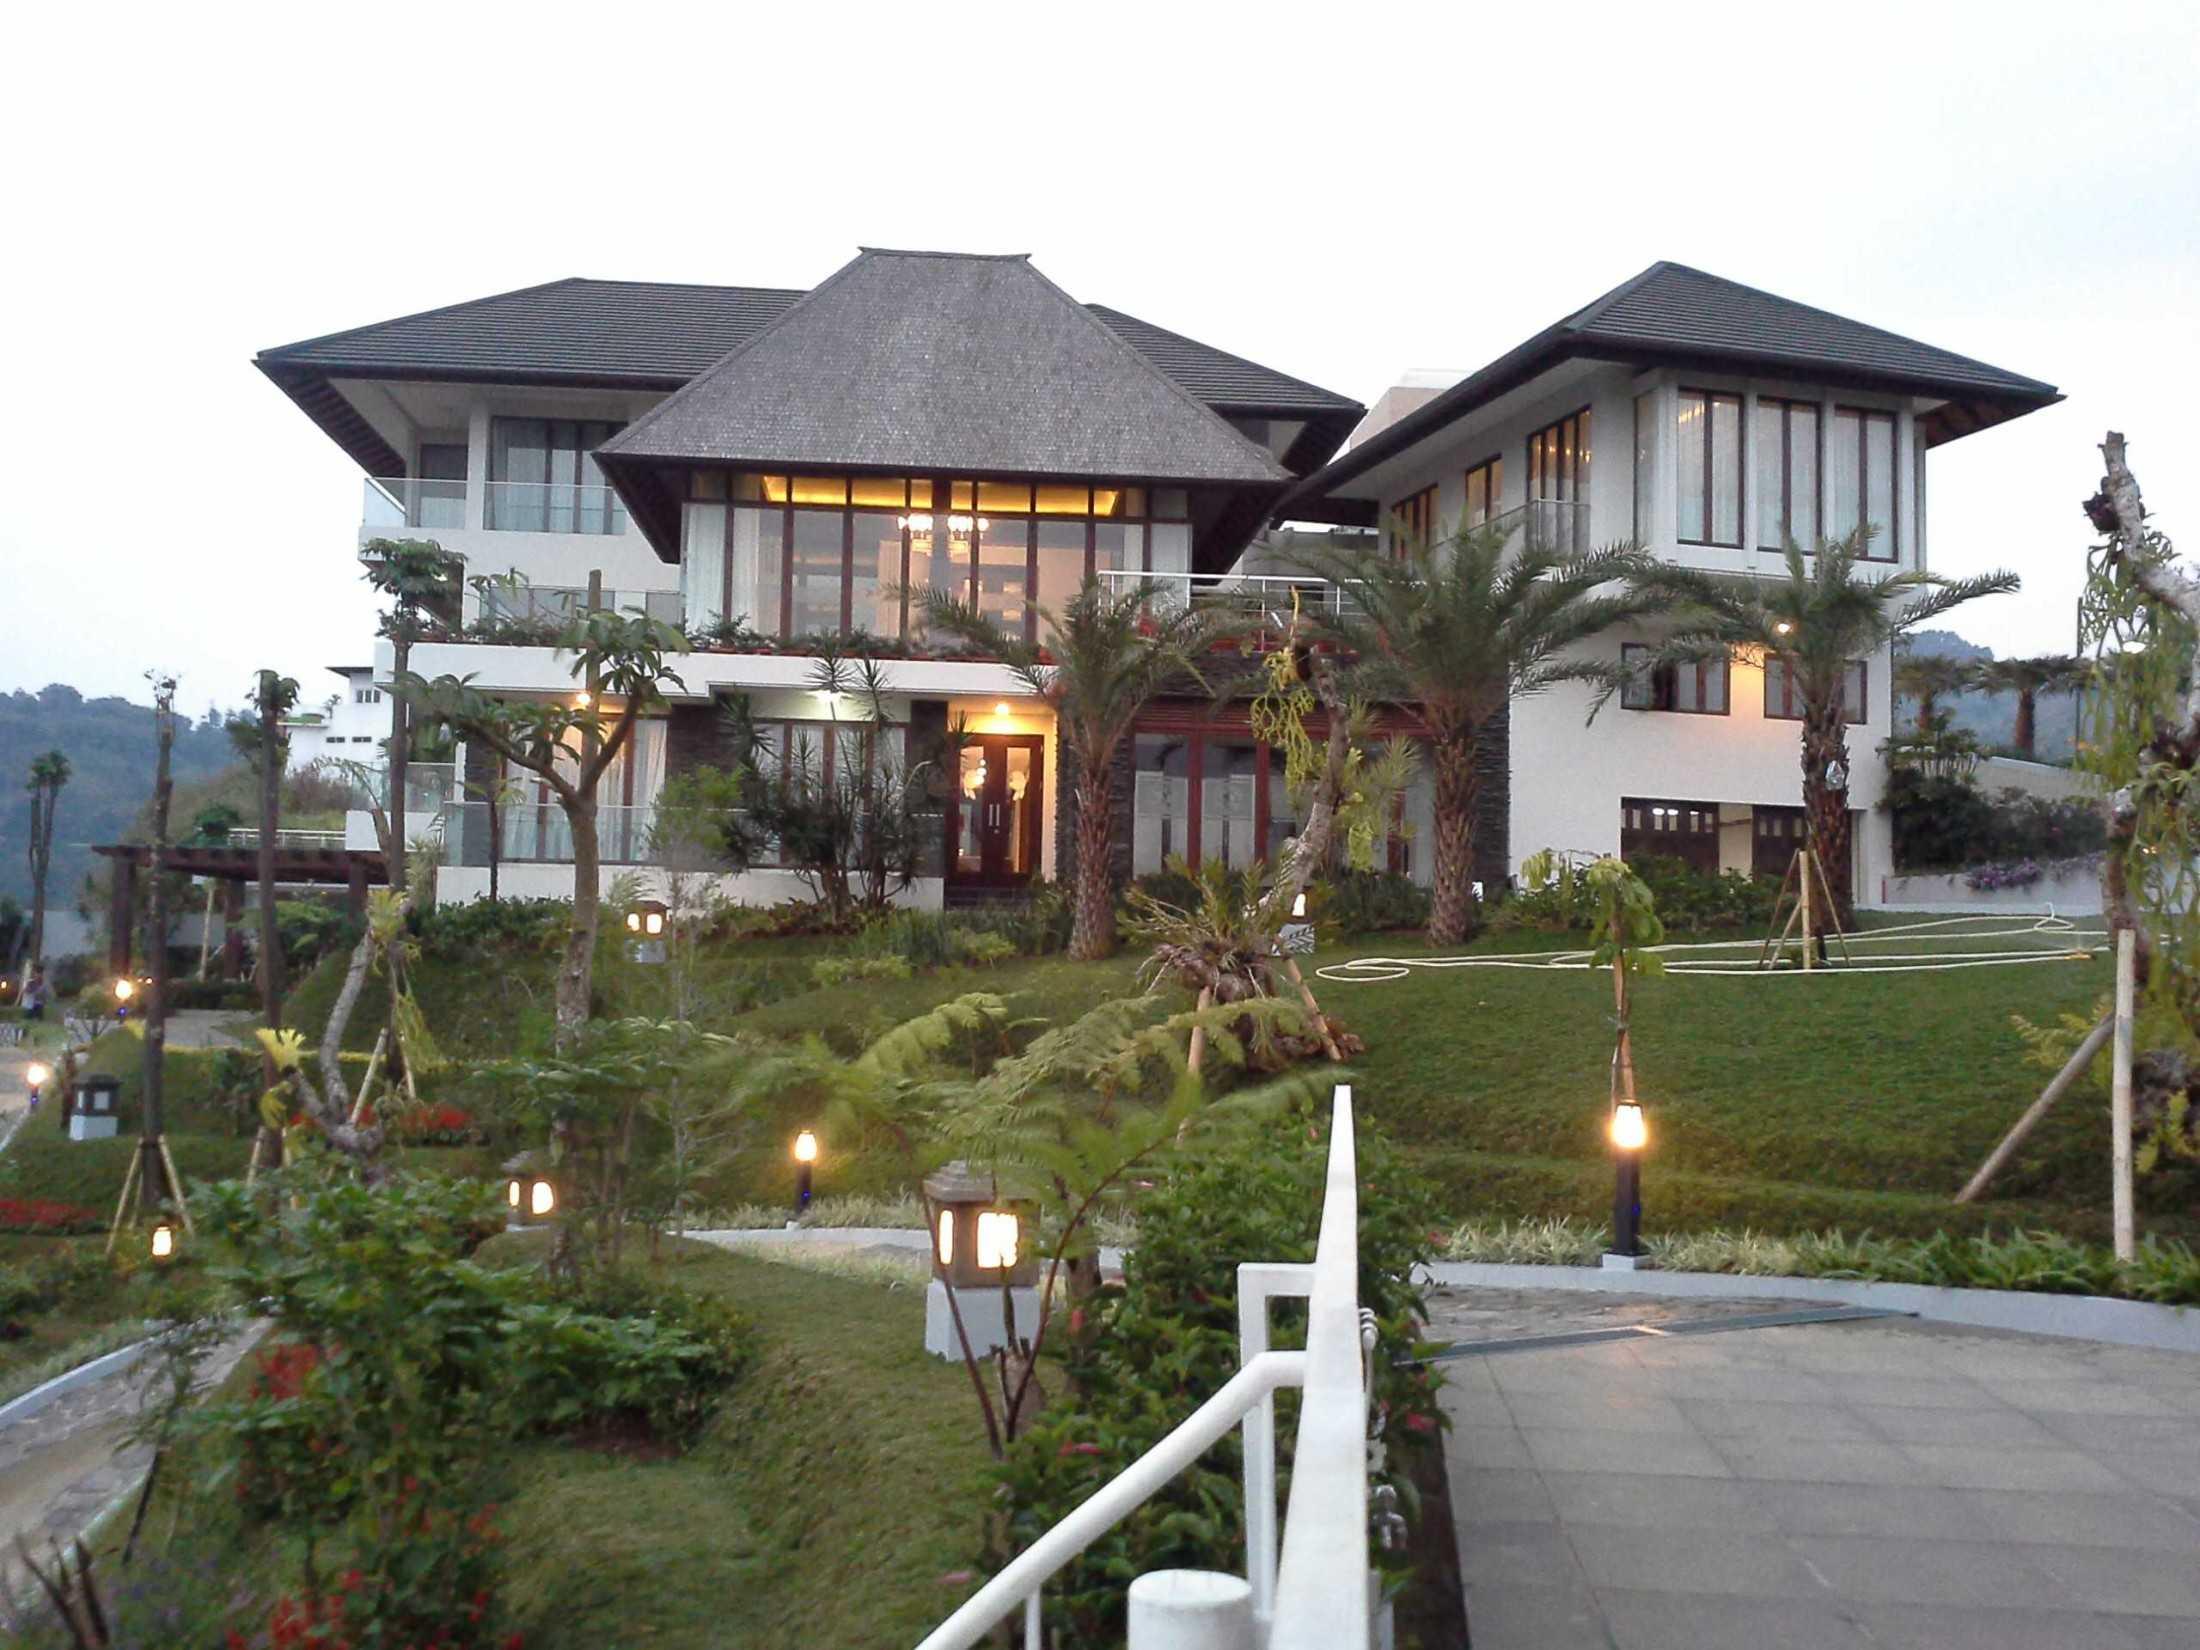 Mata Air Persada Jl. Dago Pakar, Bandung Bandung, Jawa Barat, Indonesia Bandung, Jawa Barat, Indonesia Mata-Air-Persada-Dago-Pakar-Bandung  64656